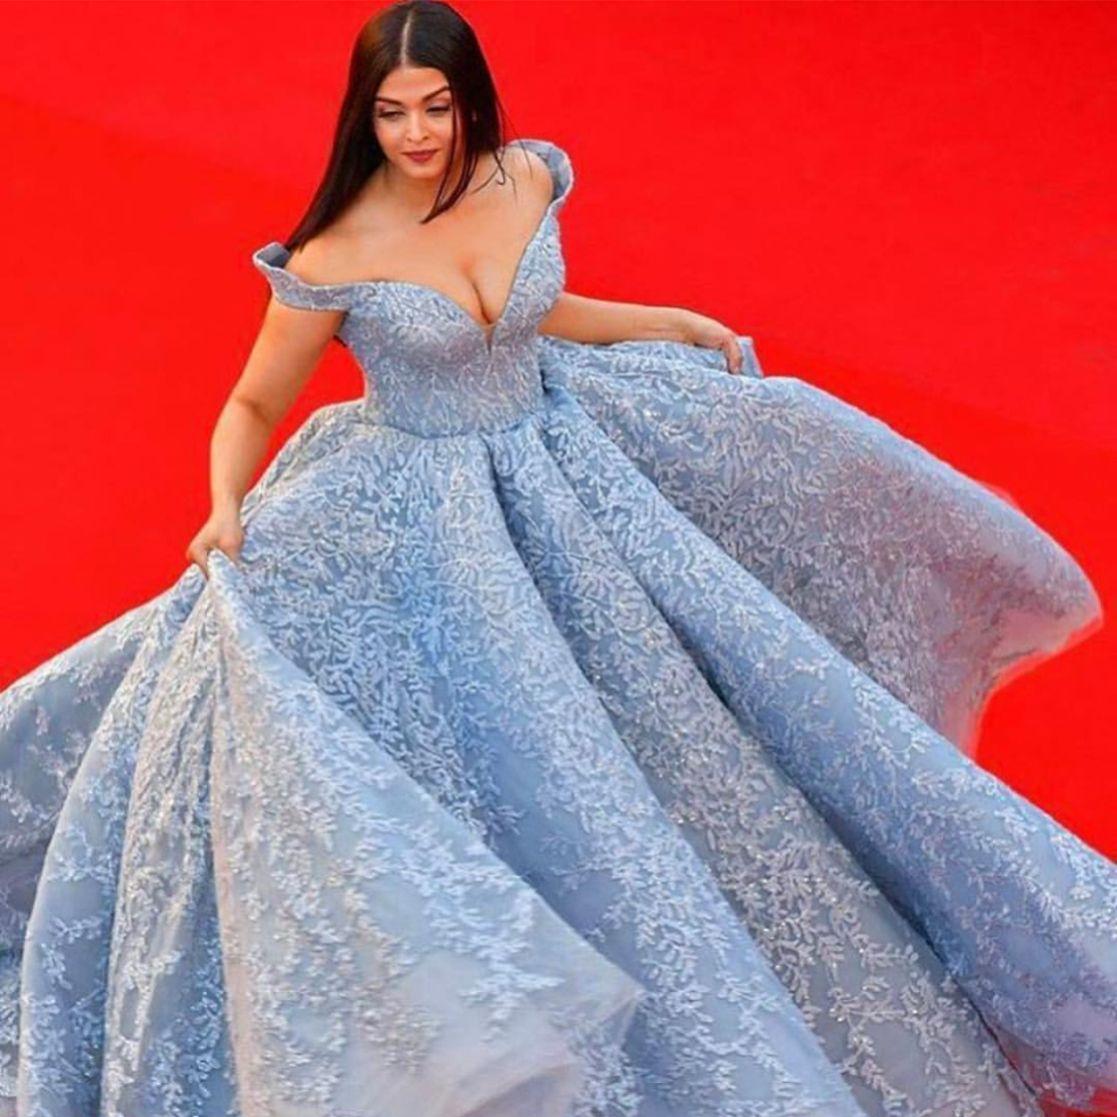 Aishwarya Rai wearing Michael Cinco at the 2017 Cannes film festival ...